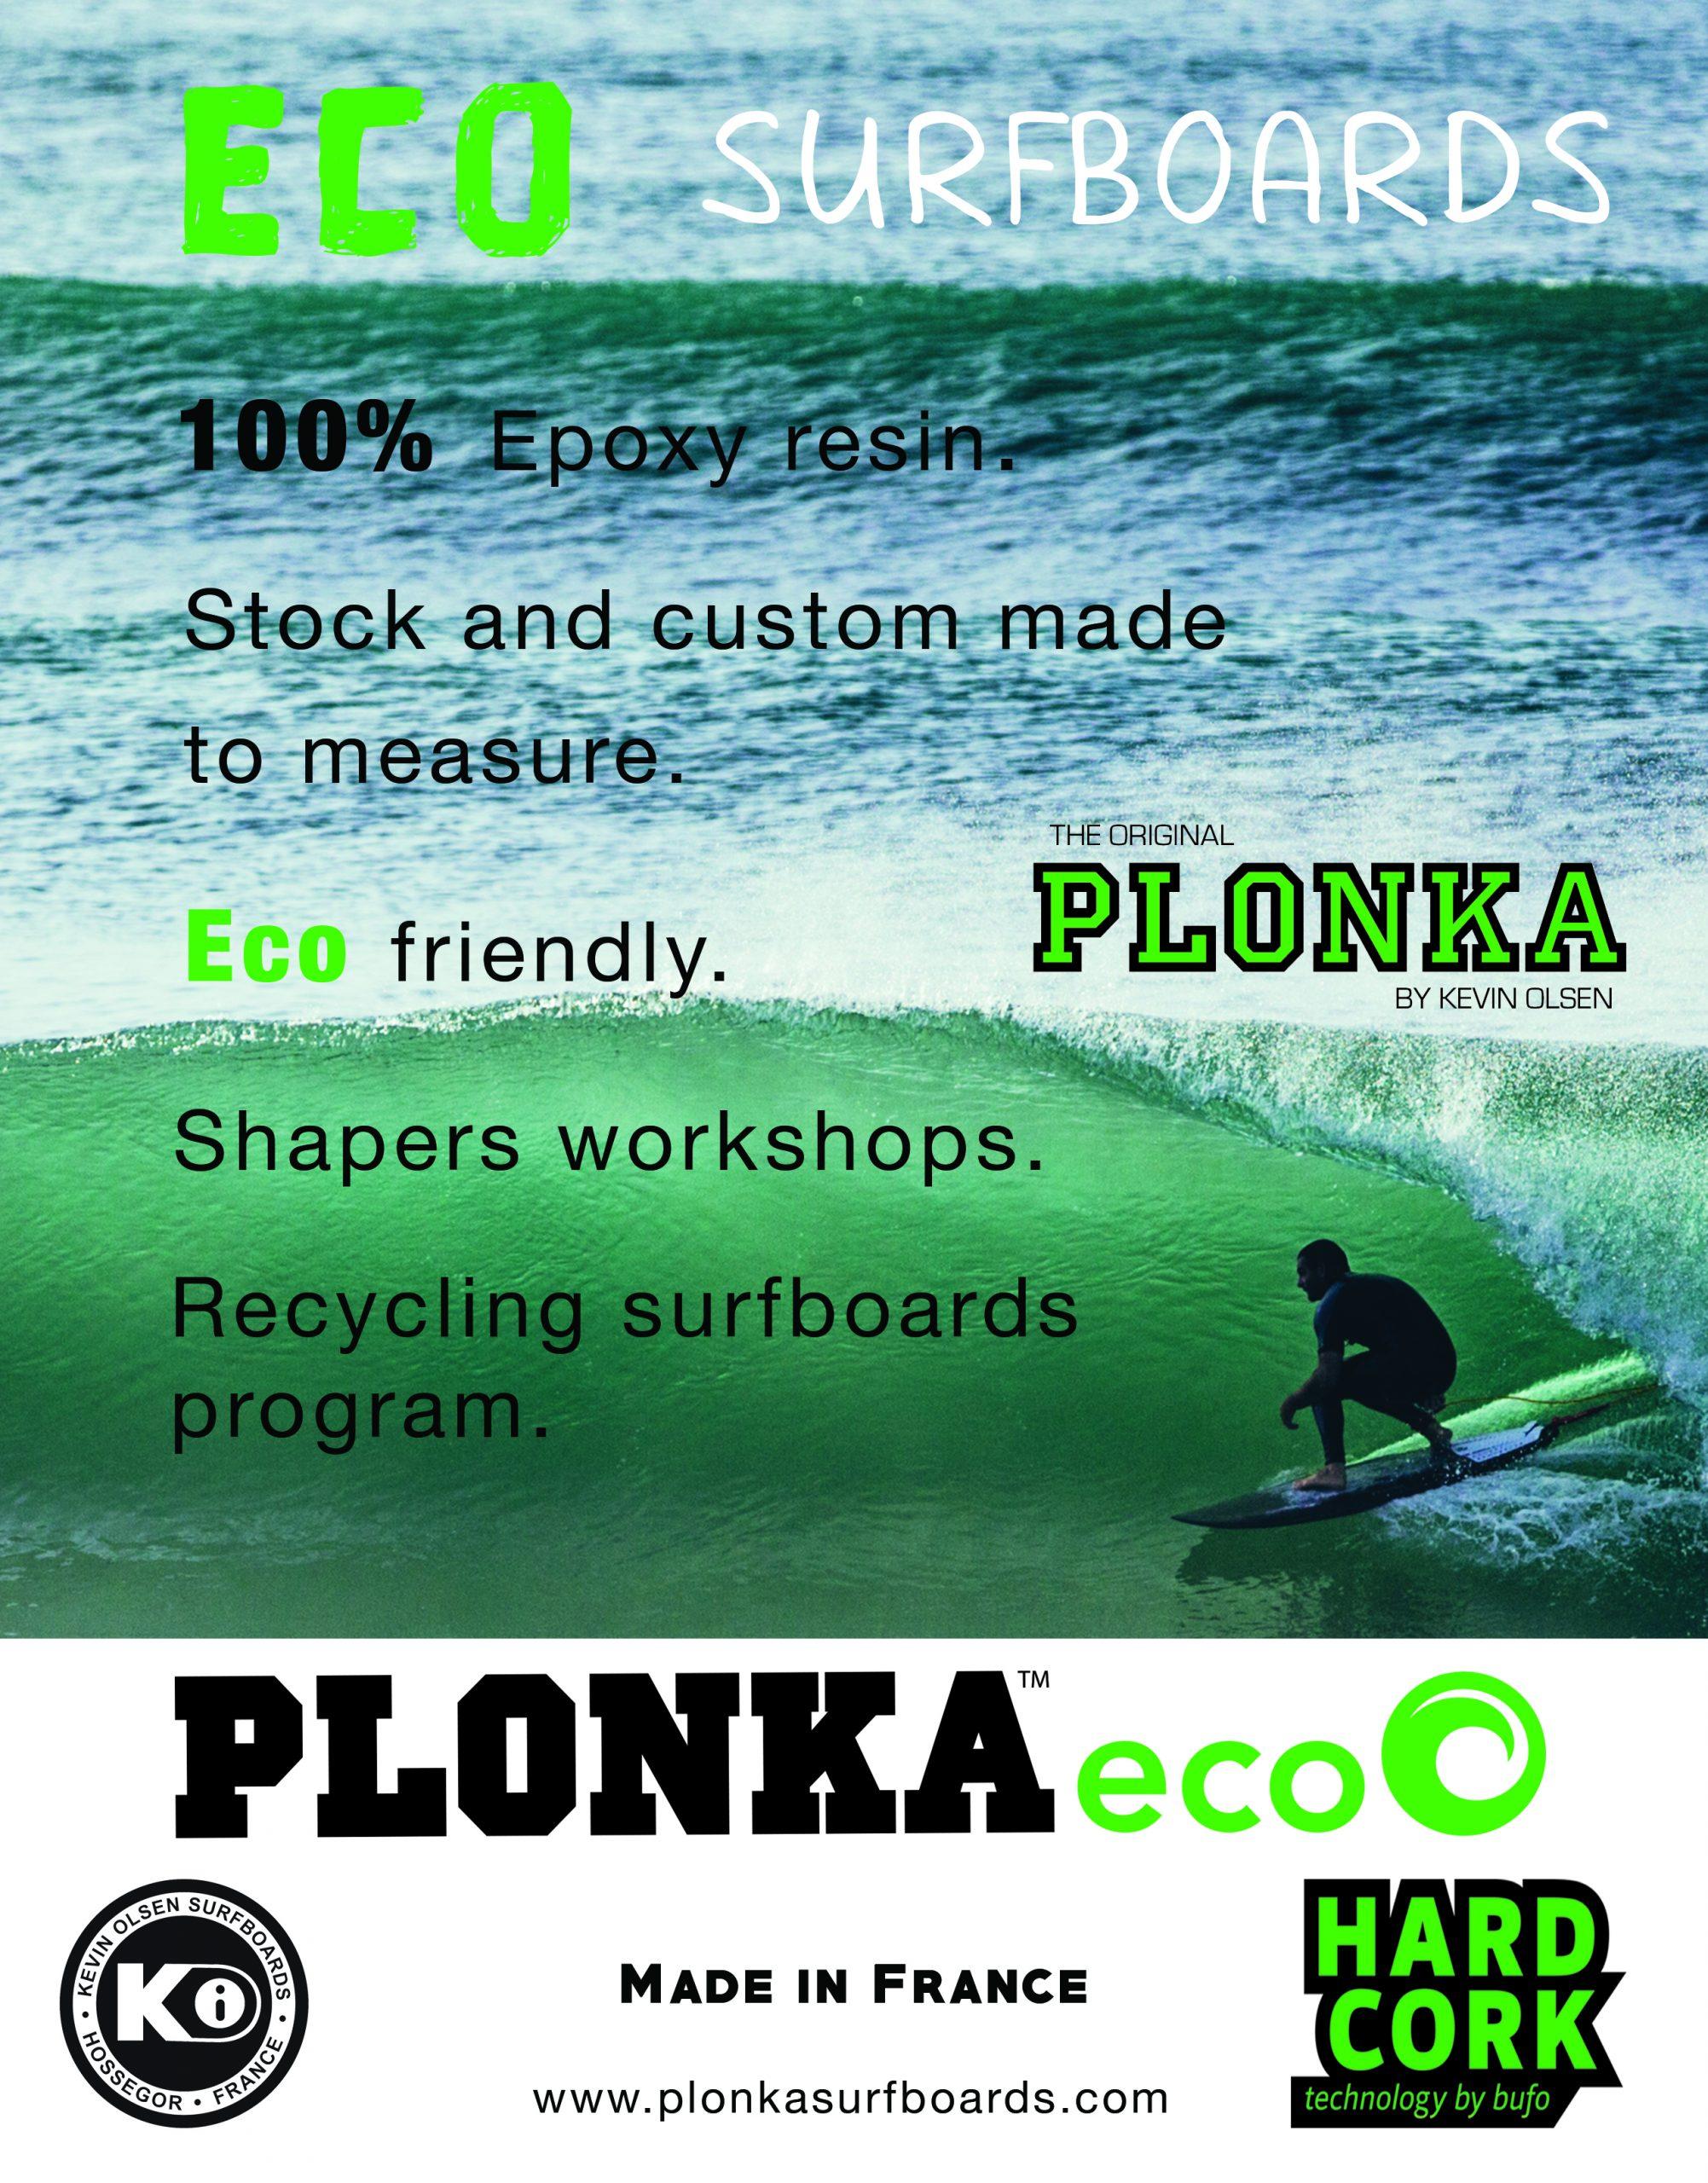 91 Plonka Surfboards